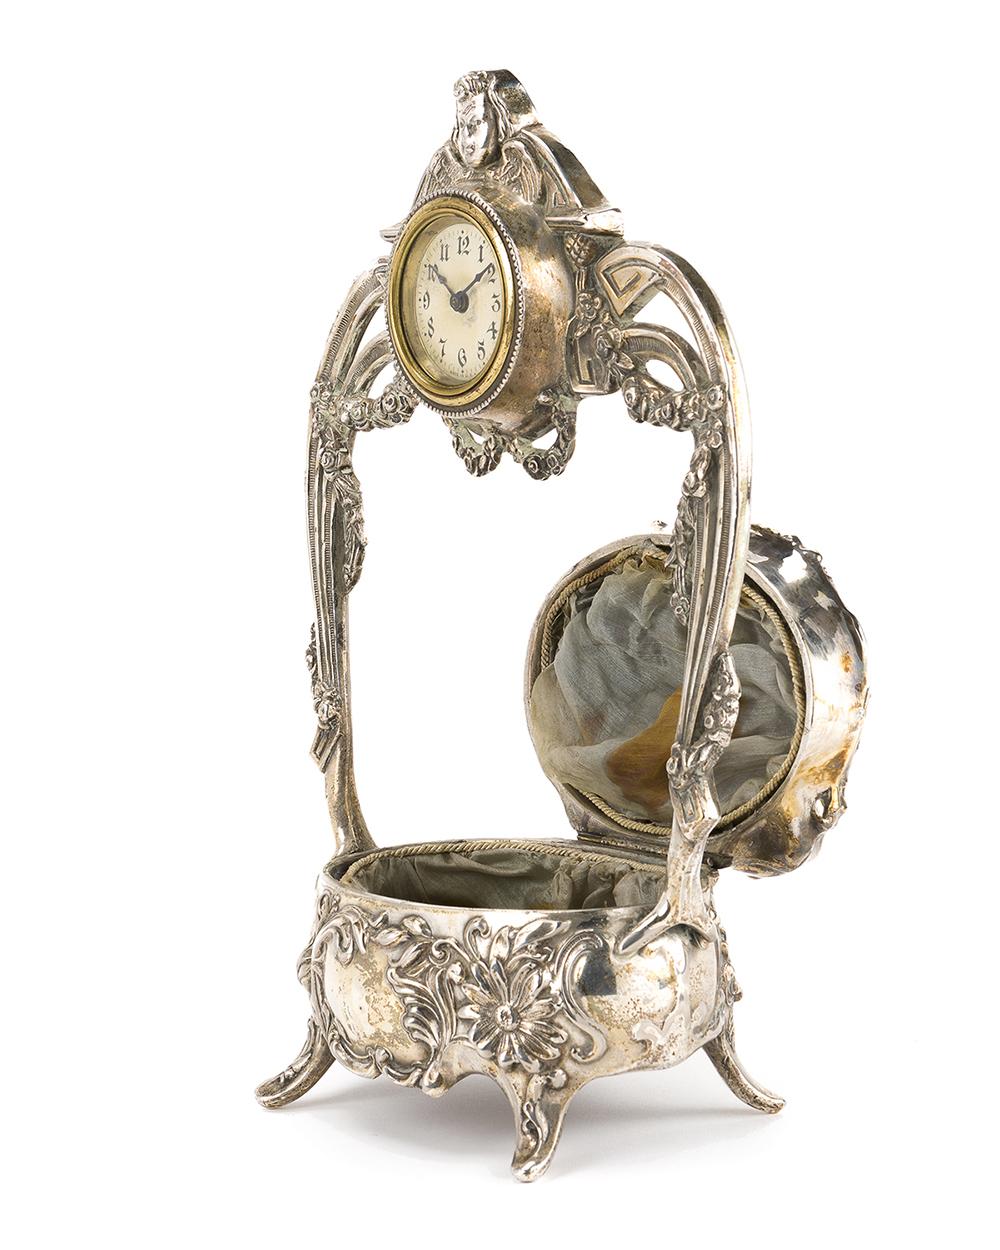 Lot 1323 - An Art Nouveau silver plated jewelry box